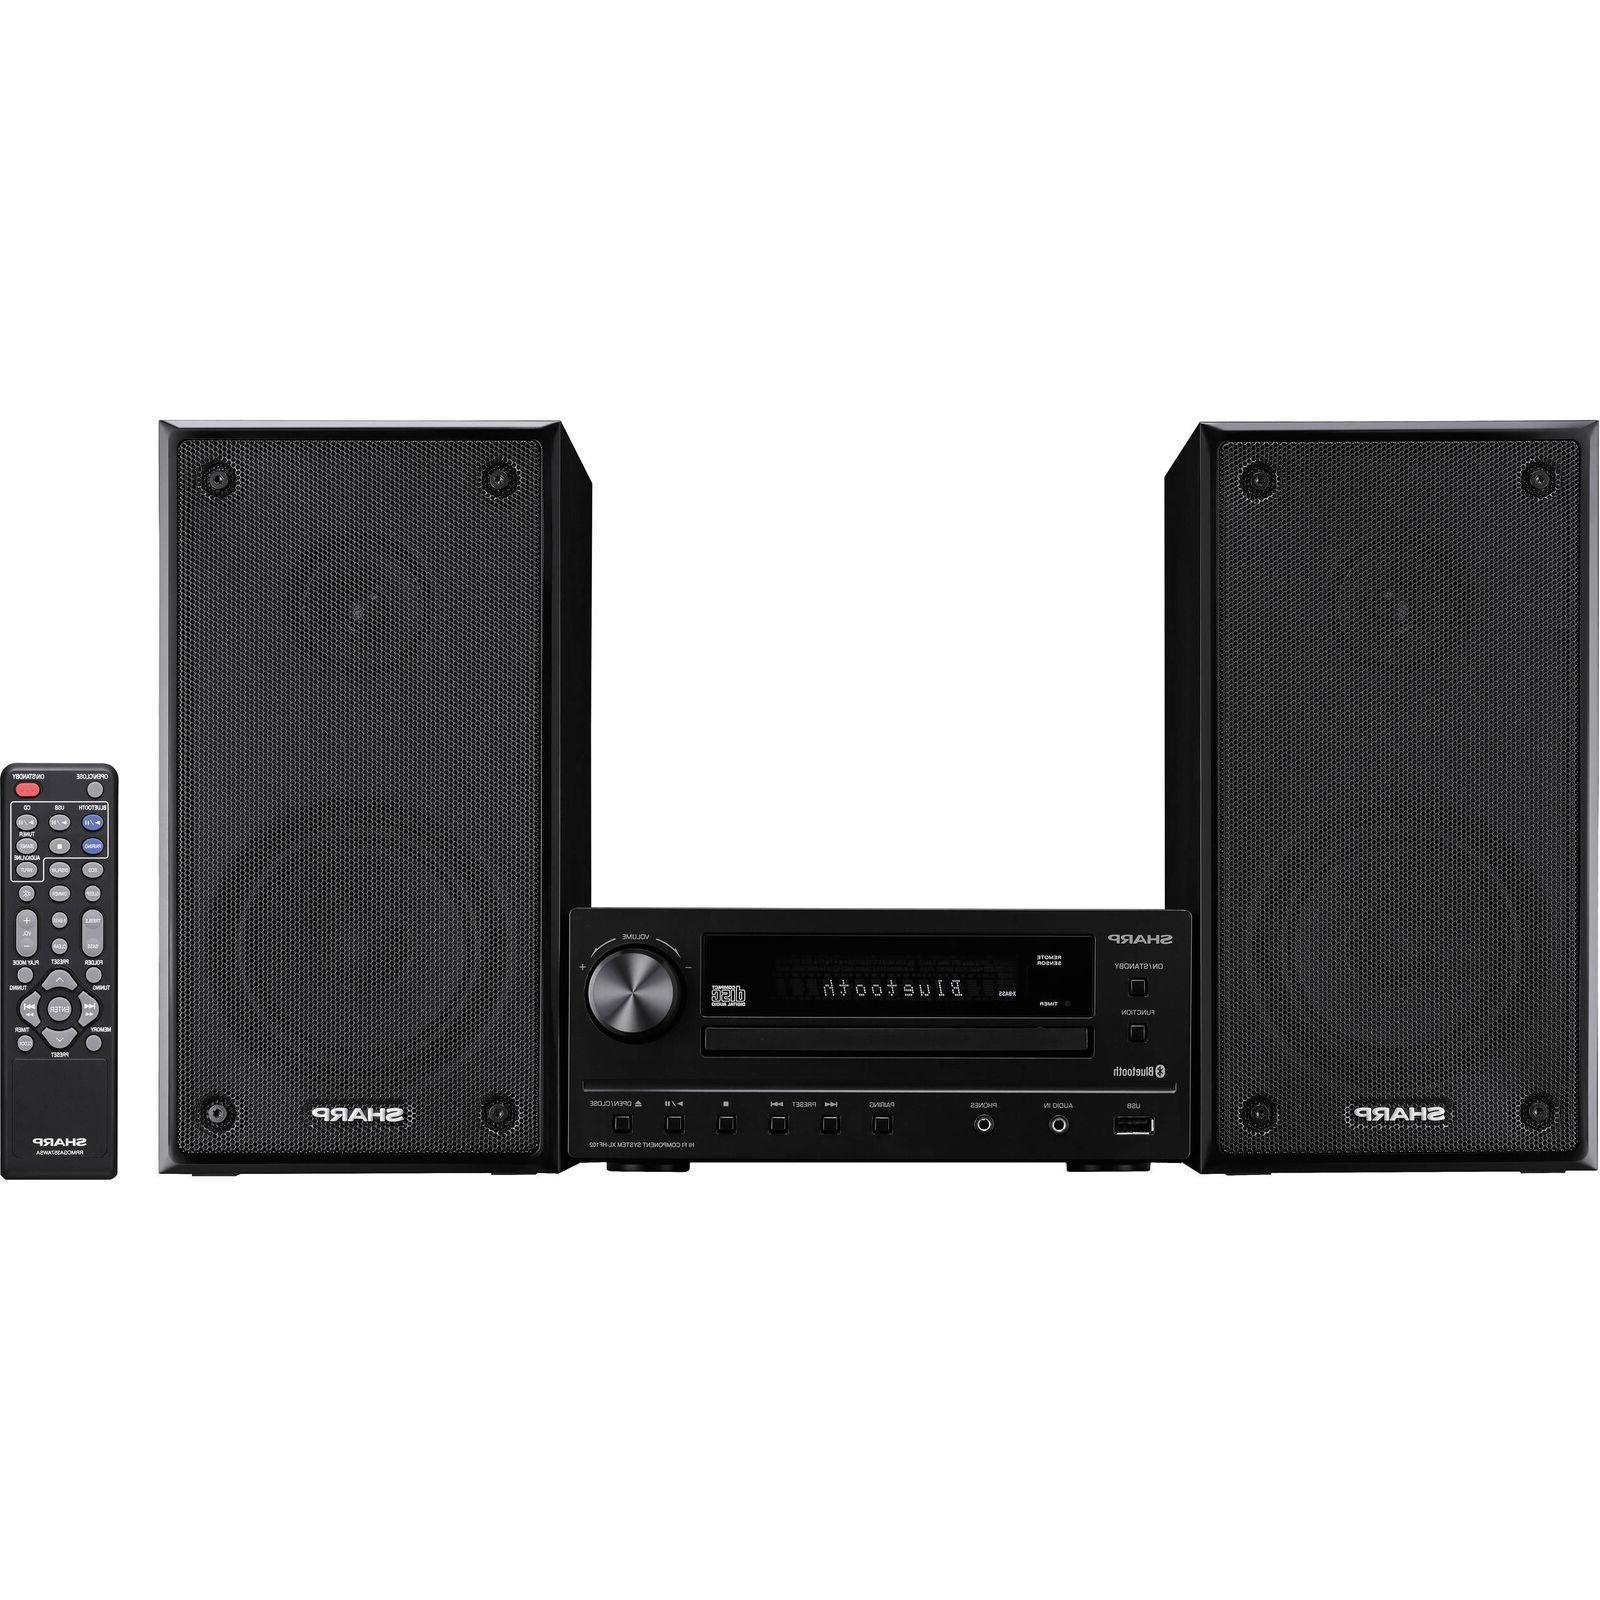 Sharp XLHF102B Hi-Fi Component Home Stereo Speaker System wi